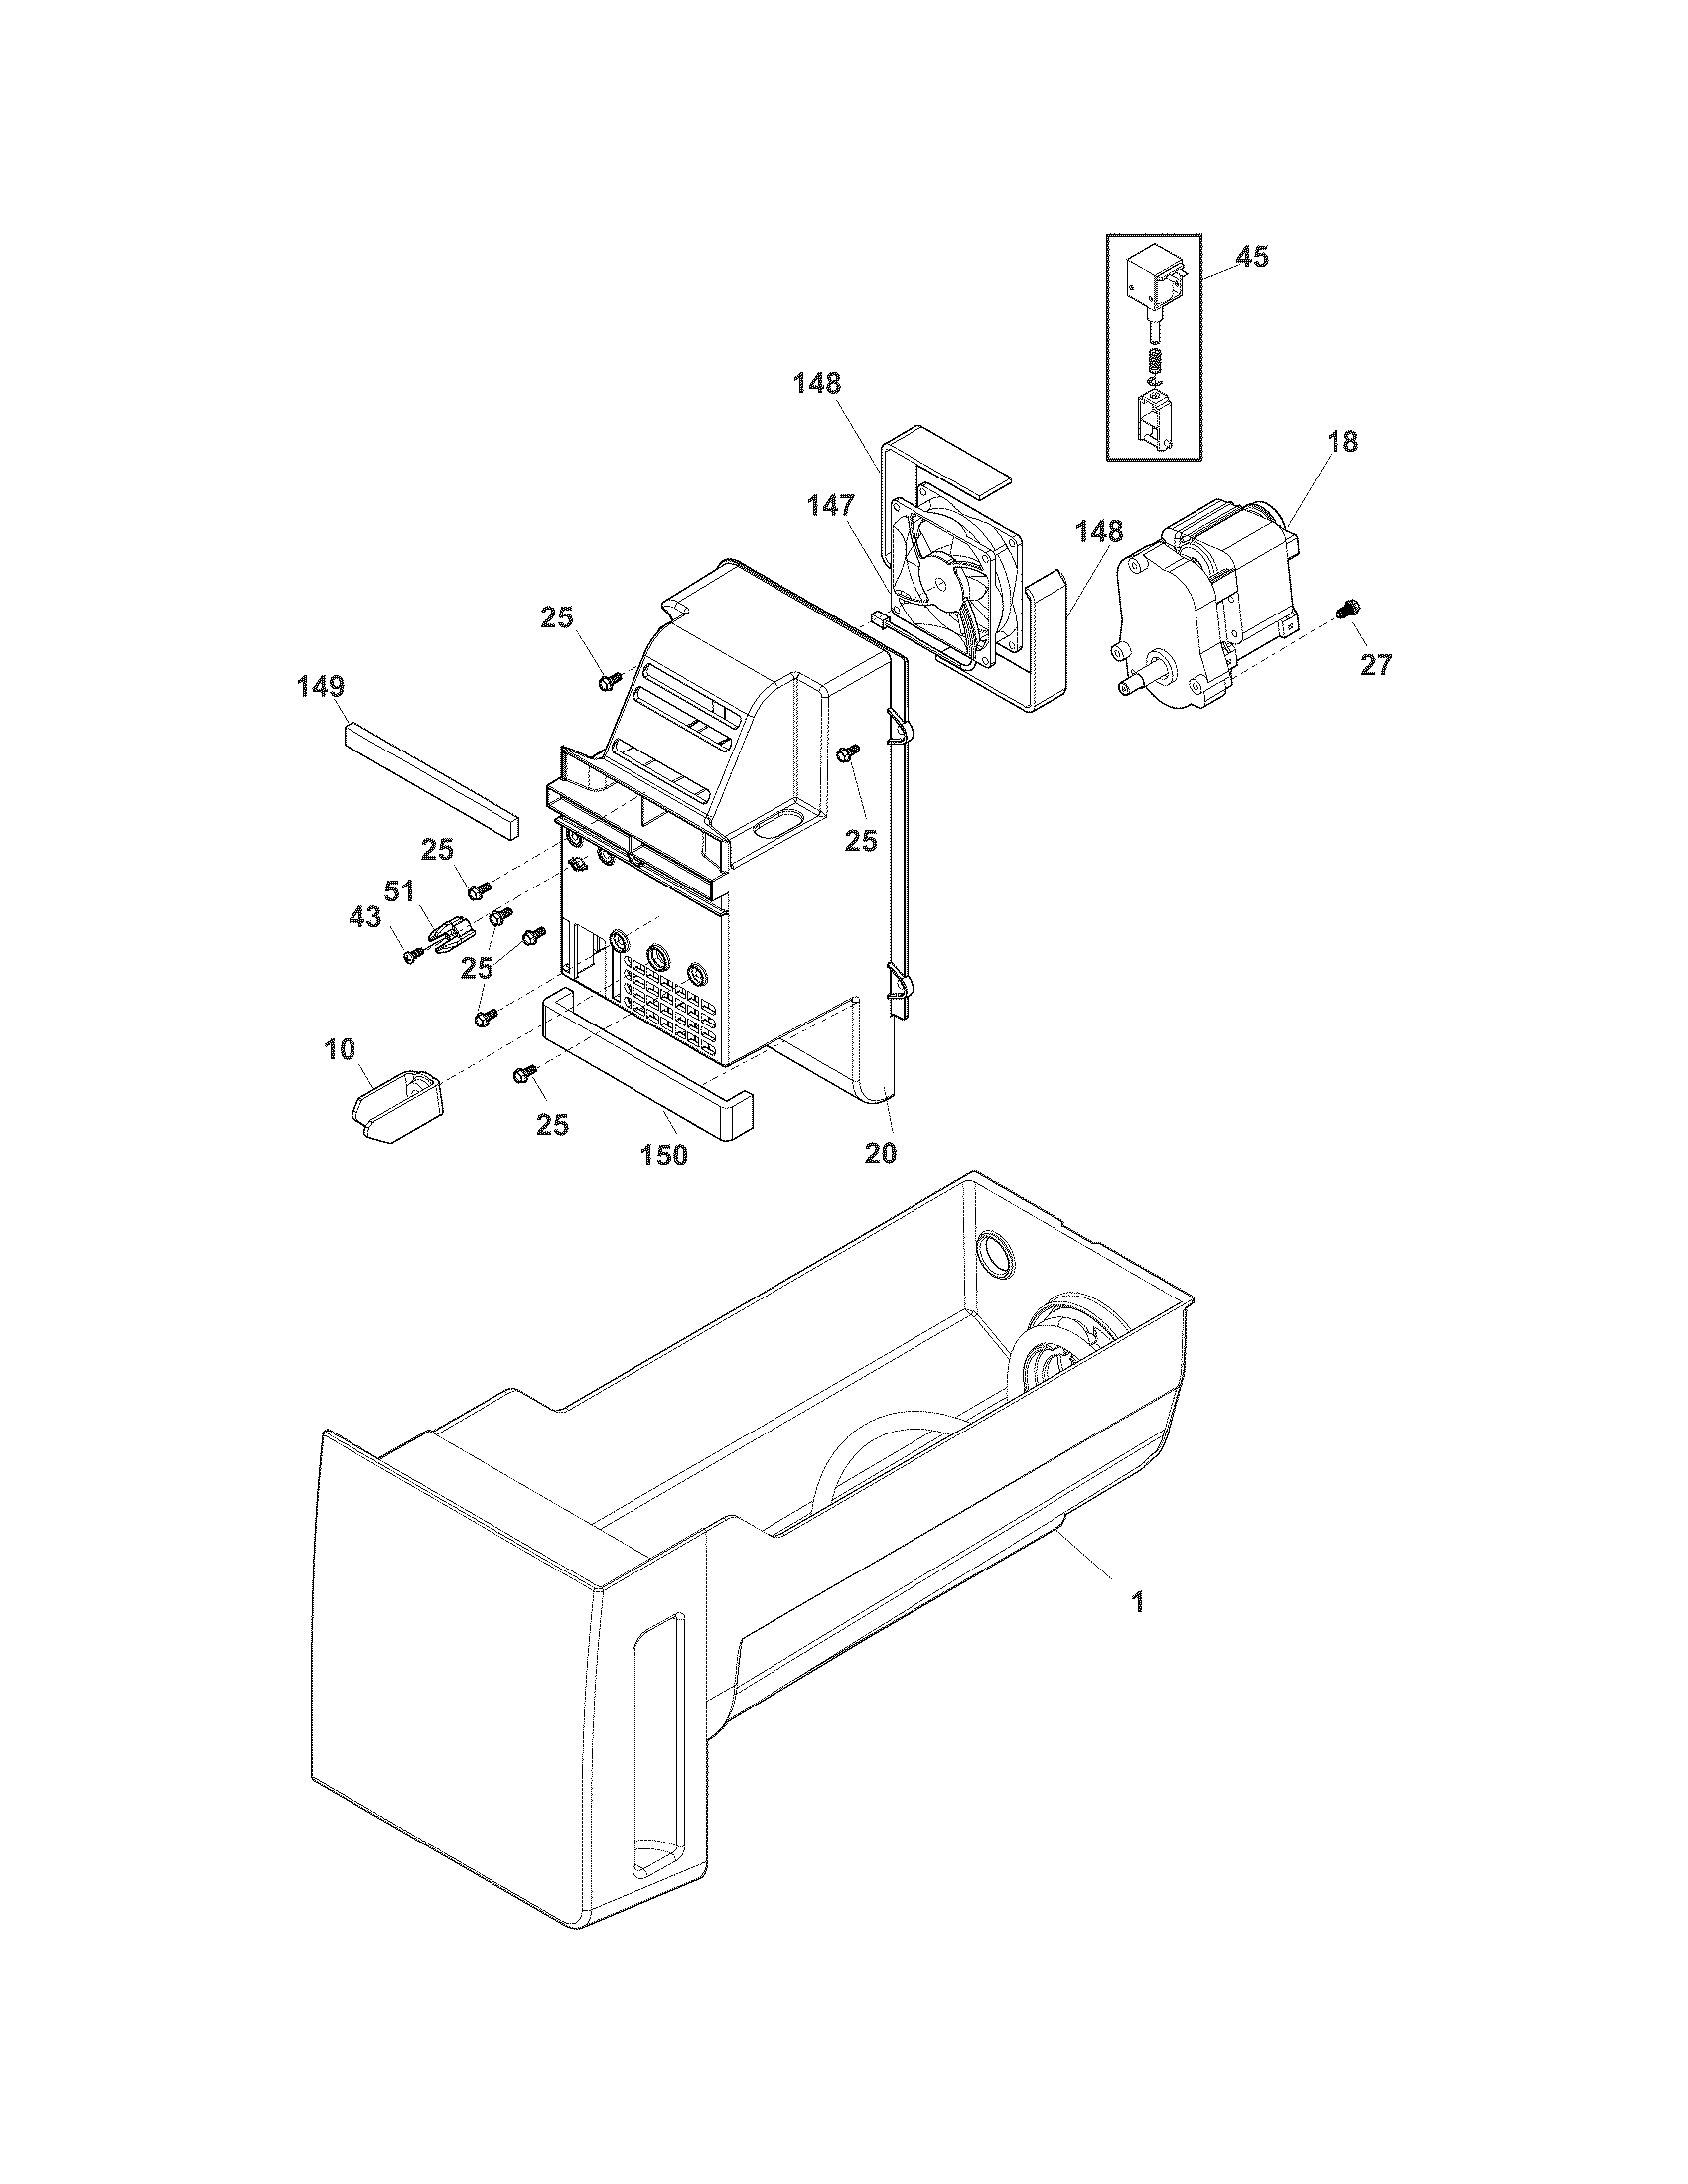 Electrolux model EI23BC35KS5 bottom-mount refrigerator